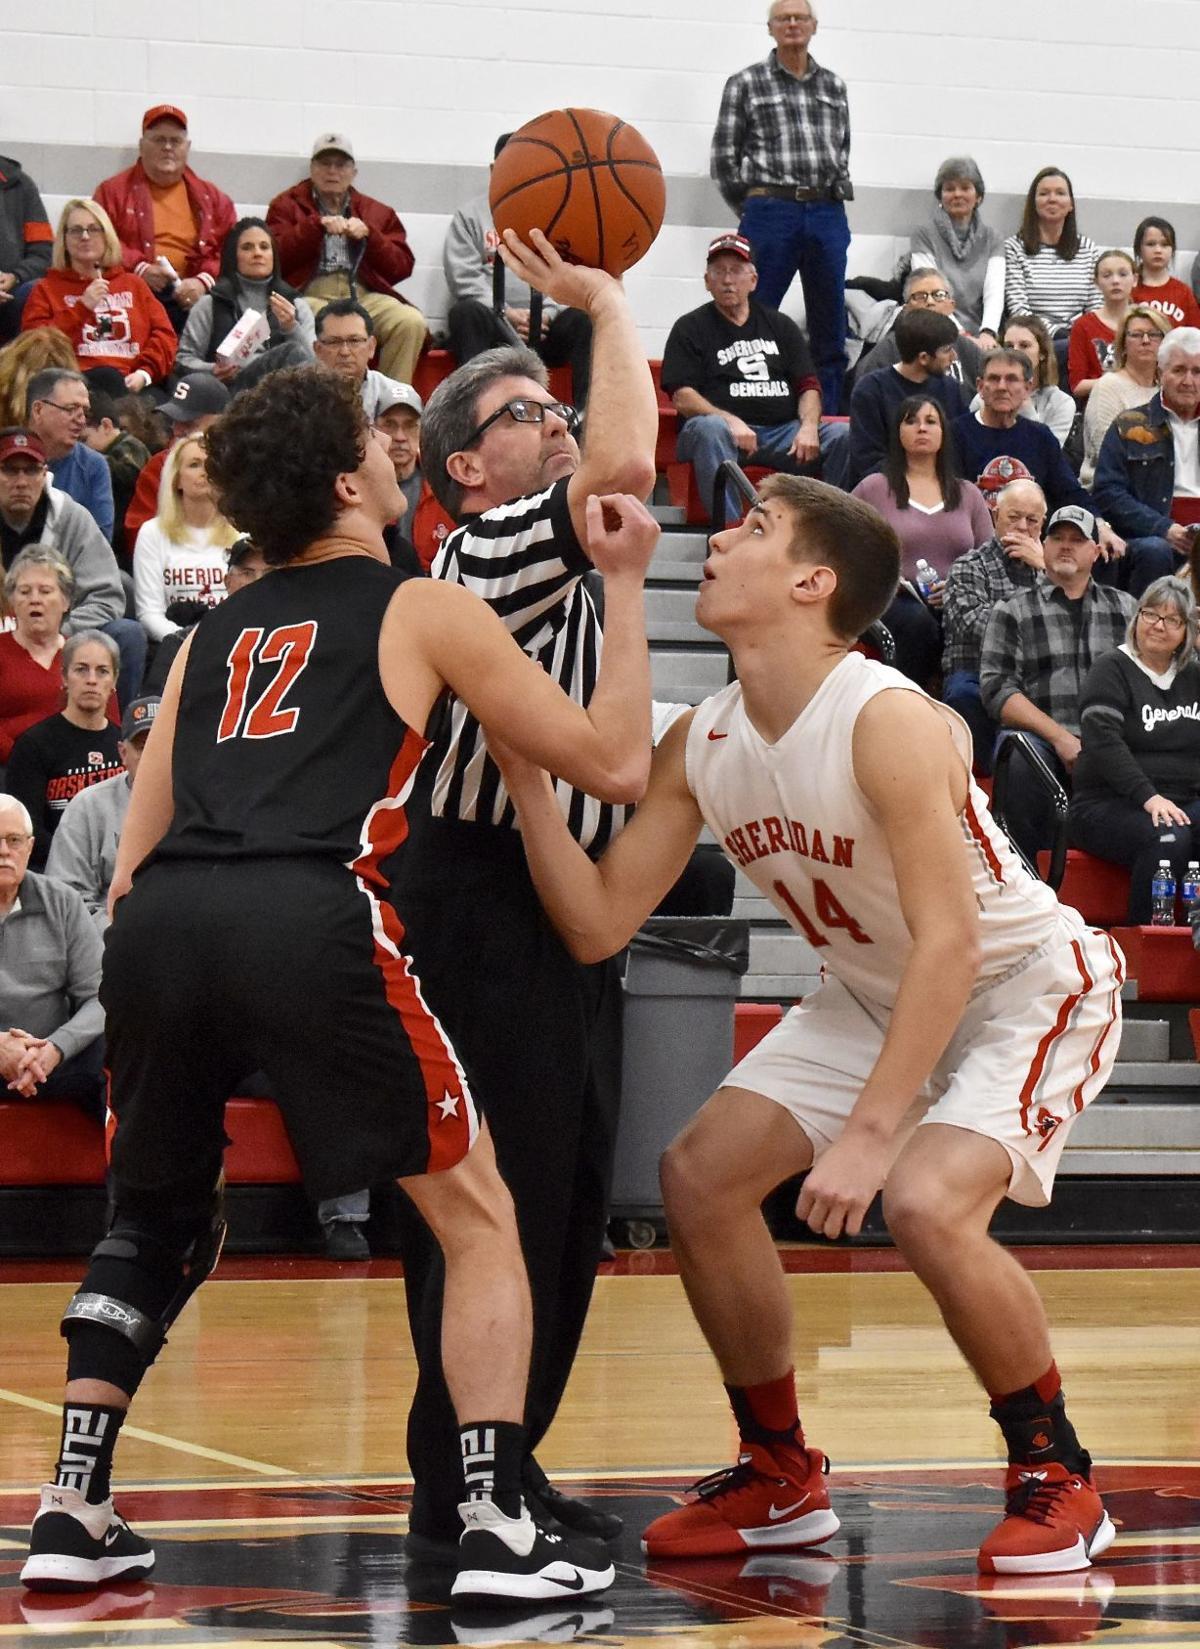 Sheridan vs Crooksville Boys Basketball